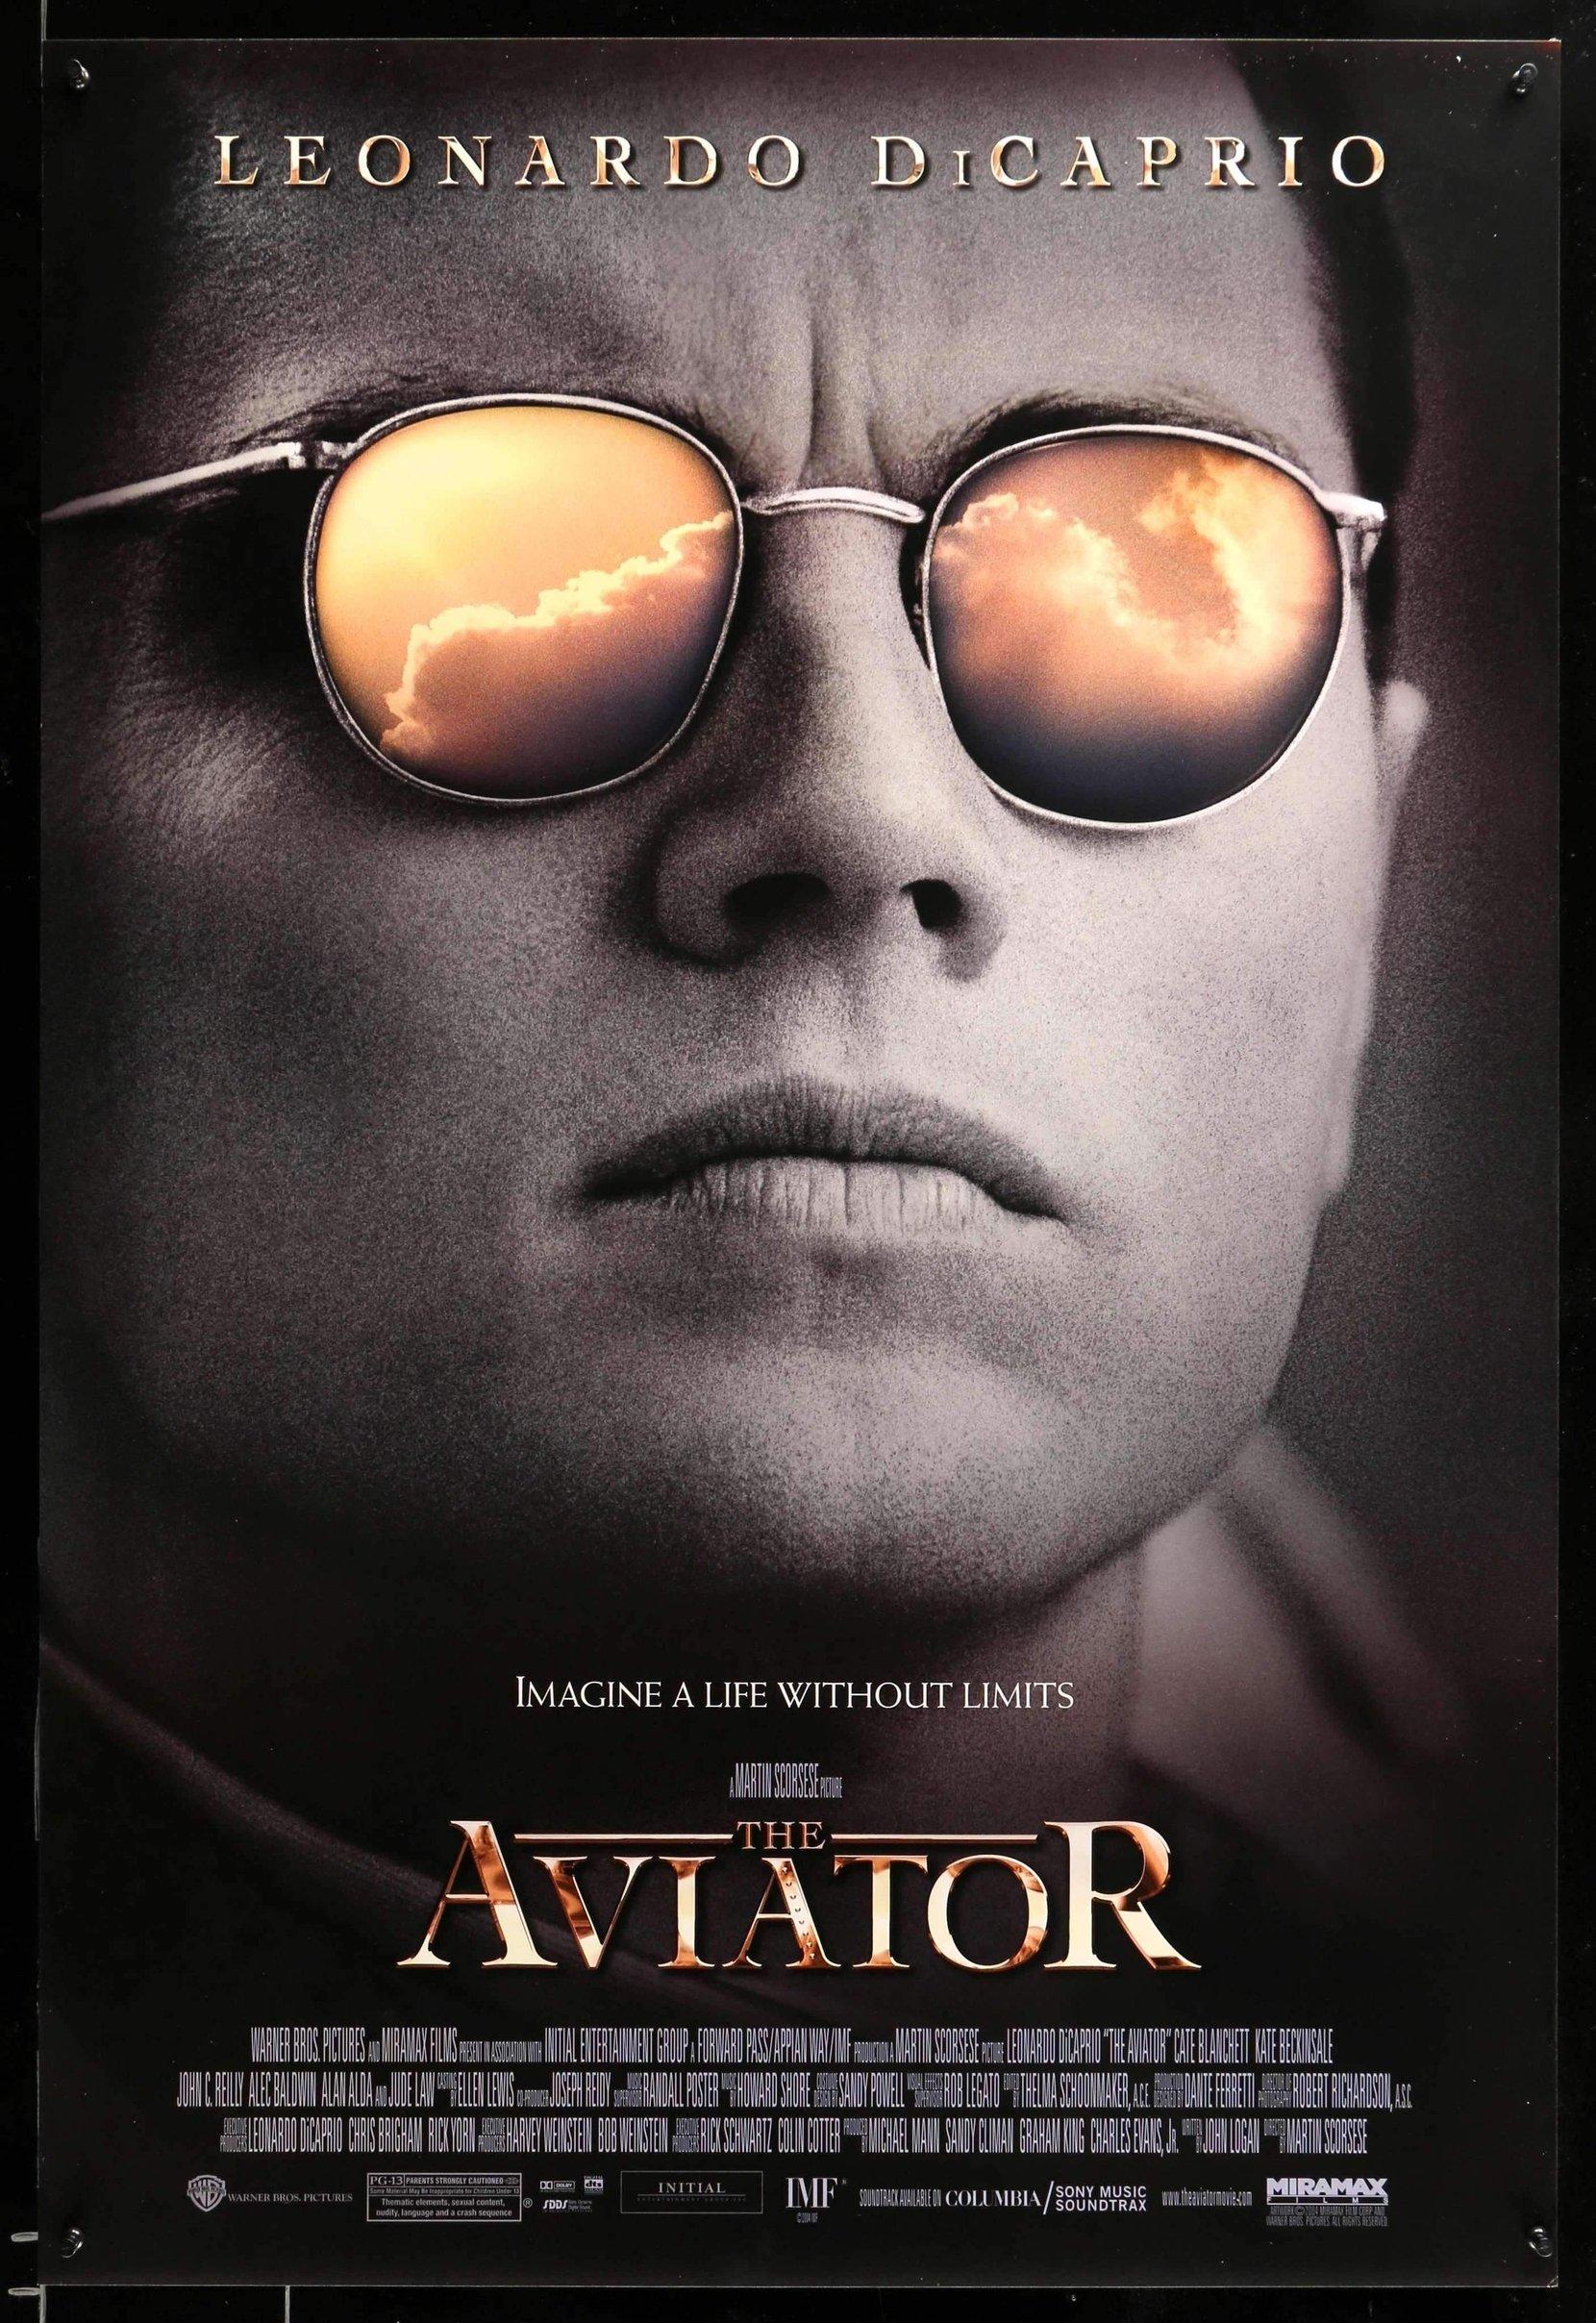 aviator_2004_Original_Film_Art_spo_2000x.jpg